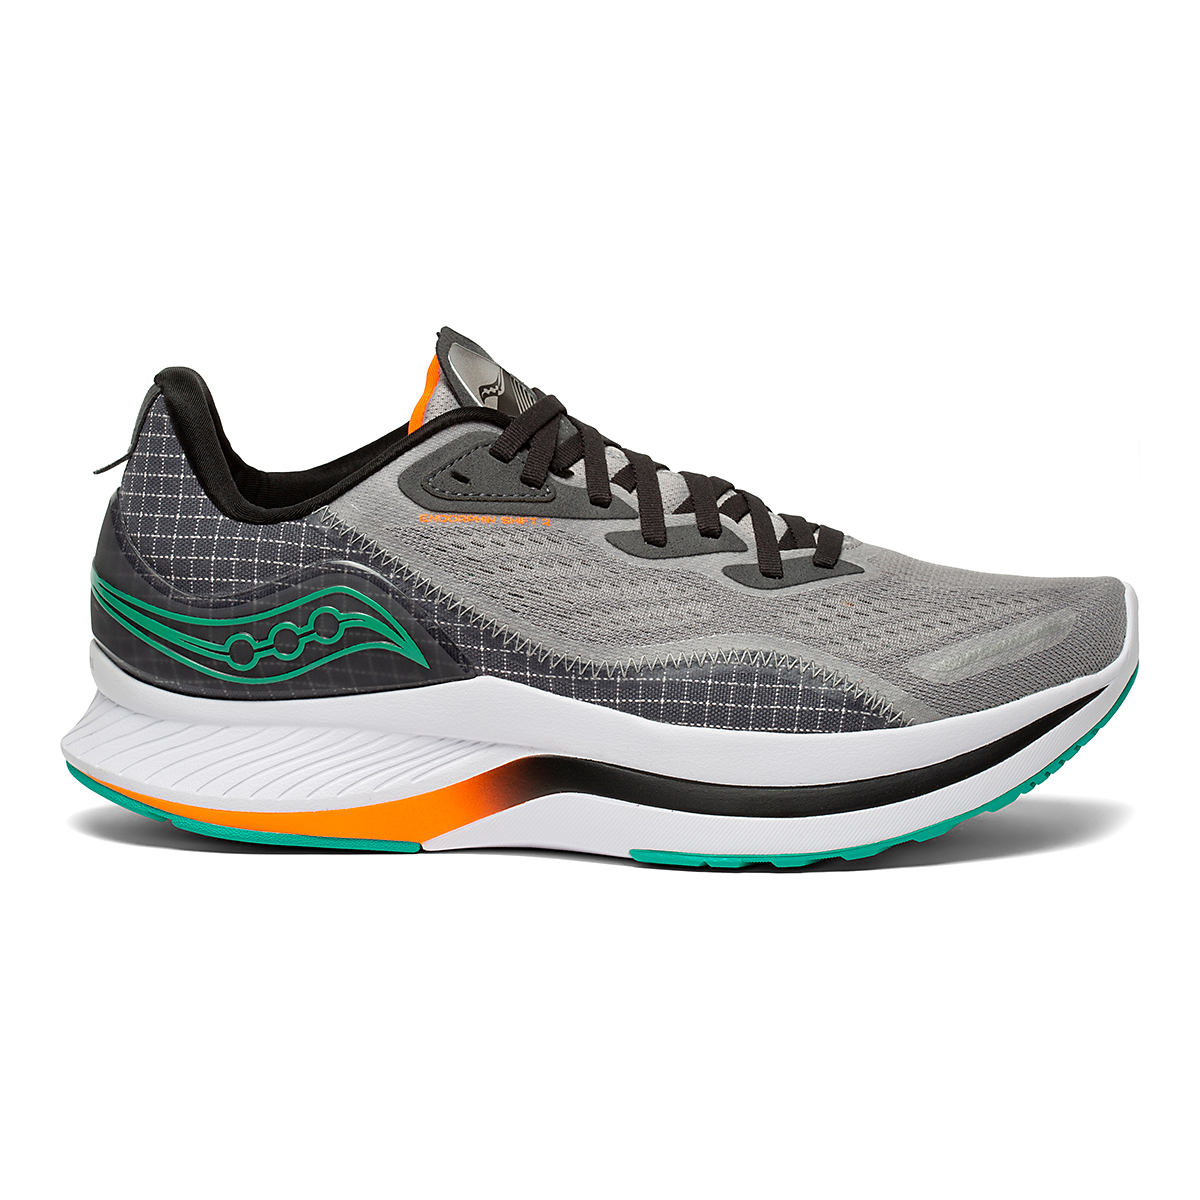 Men's Saucony Endorphin Shift 2 Running Shoe - Color: Alloy / Jade - Size: 7 - Width: Regular, Alloy / Jade, large, image 1